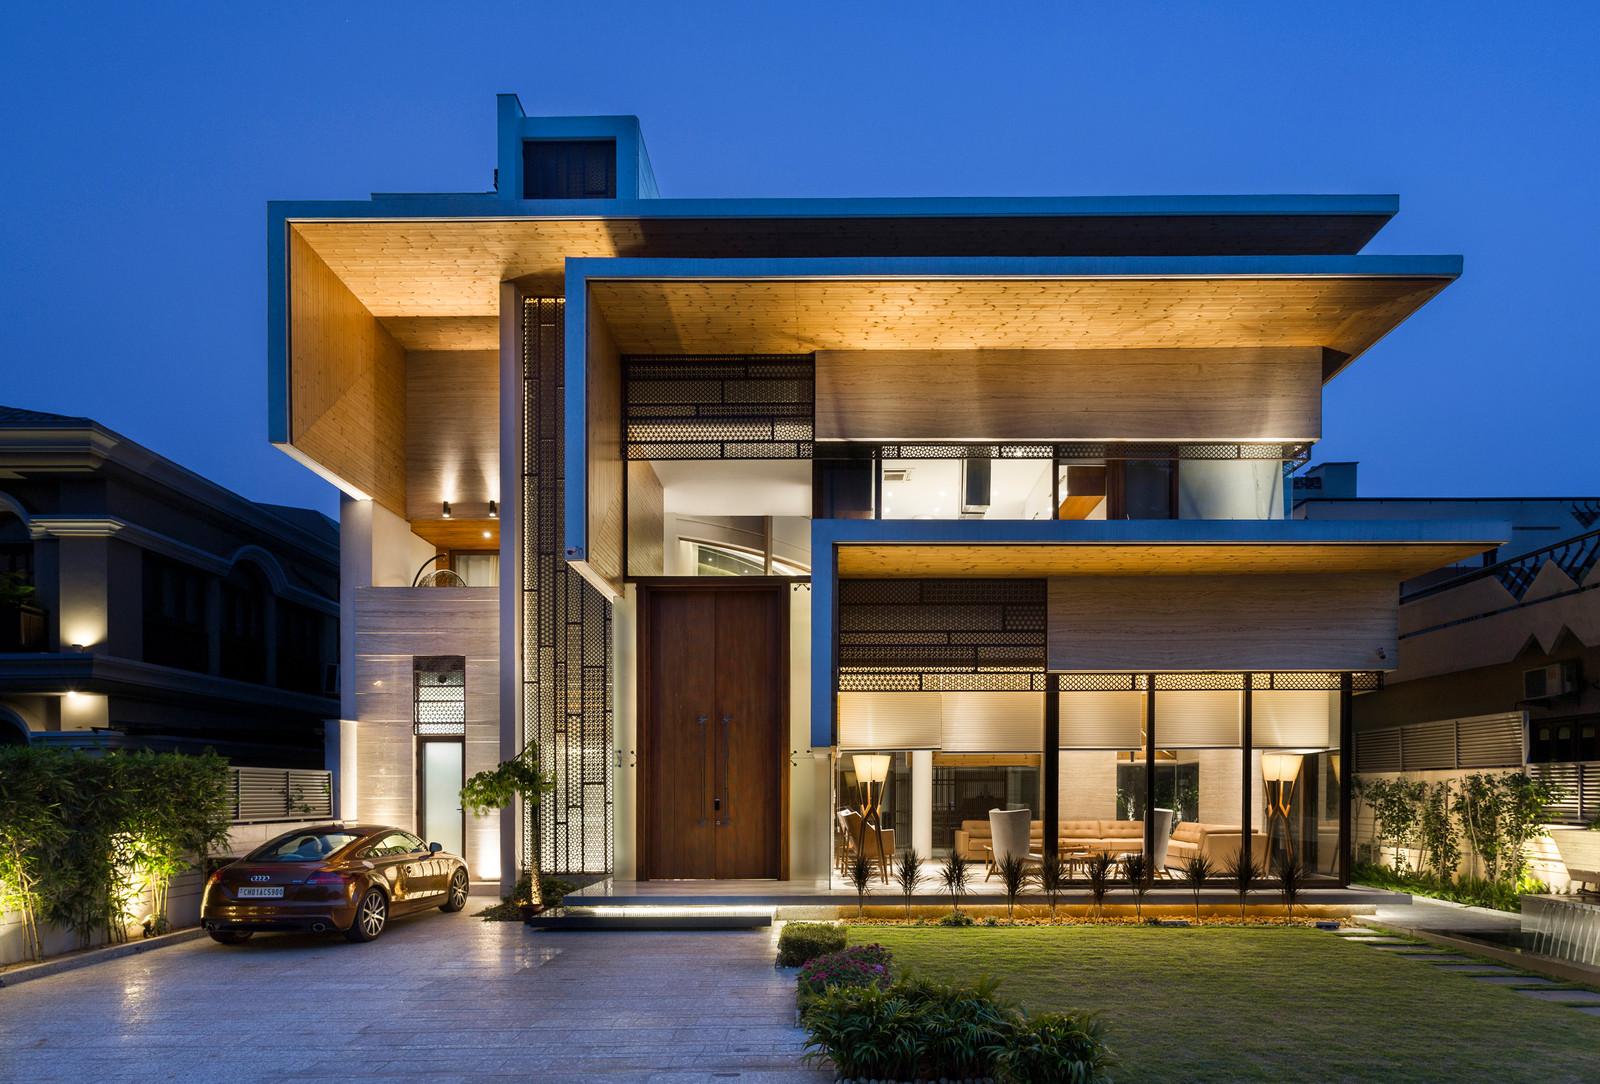 Architecture Photography India purnesh dev nikhanj photography   architectural photographer in